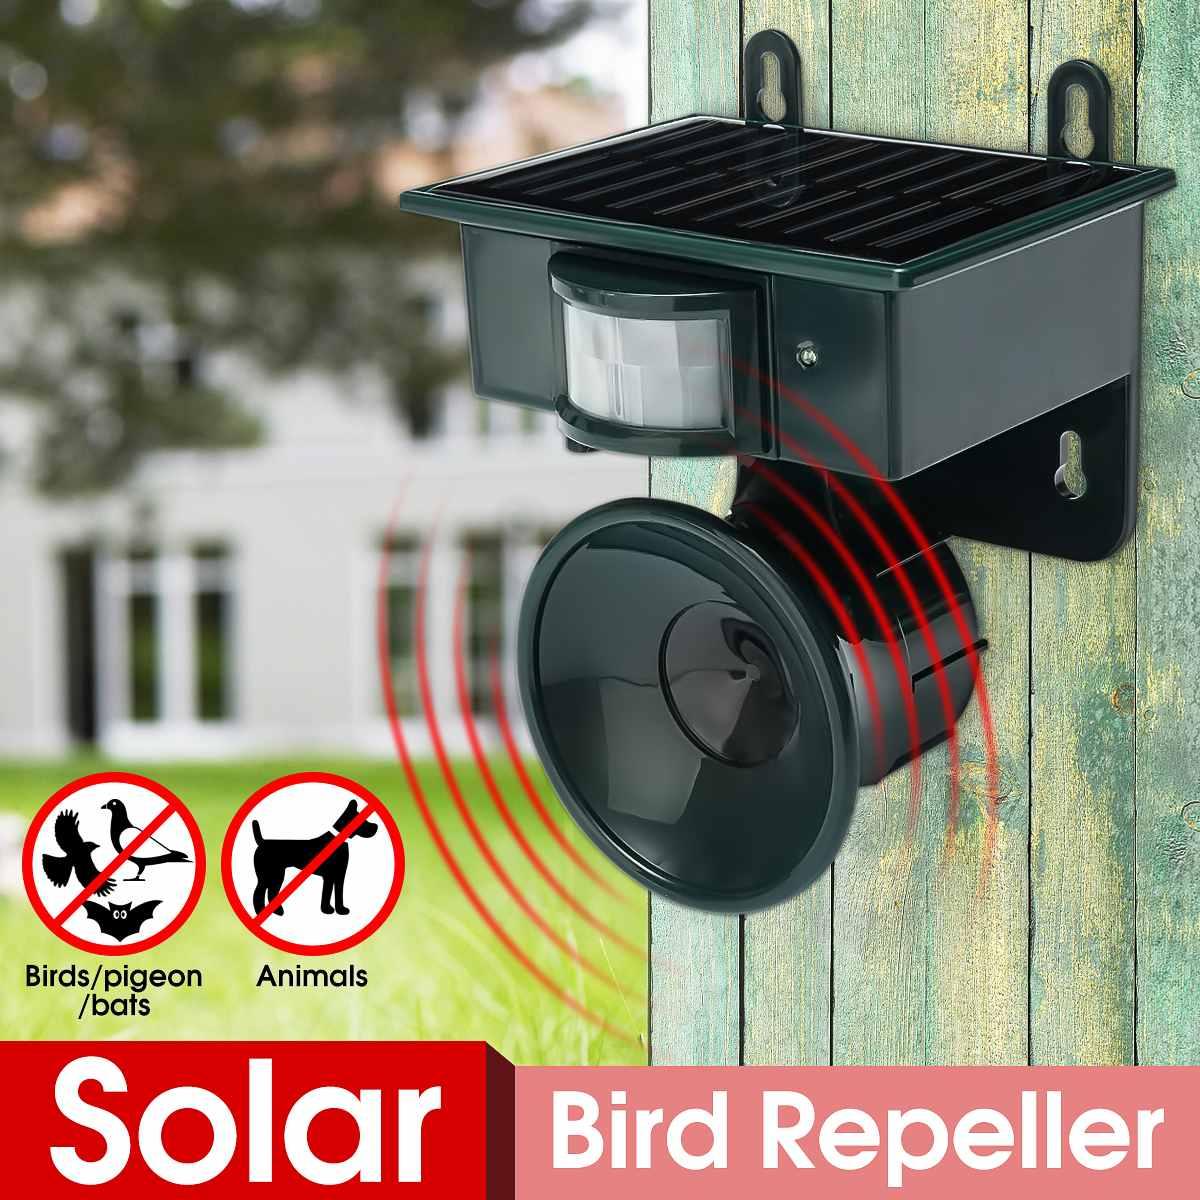 Ultrasonic PIR Outdoor Solar Animal Bird Cat Dog Mouse Fox Repeller Repellent Scarer Garden Supplies